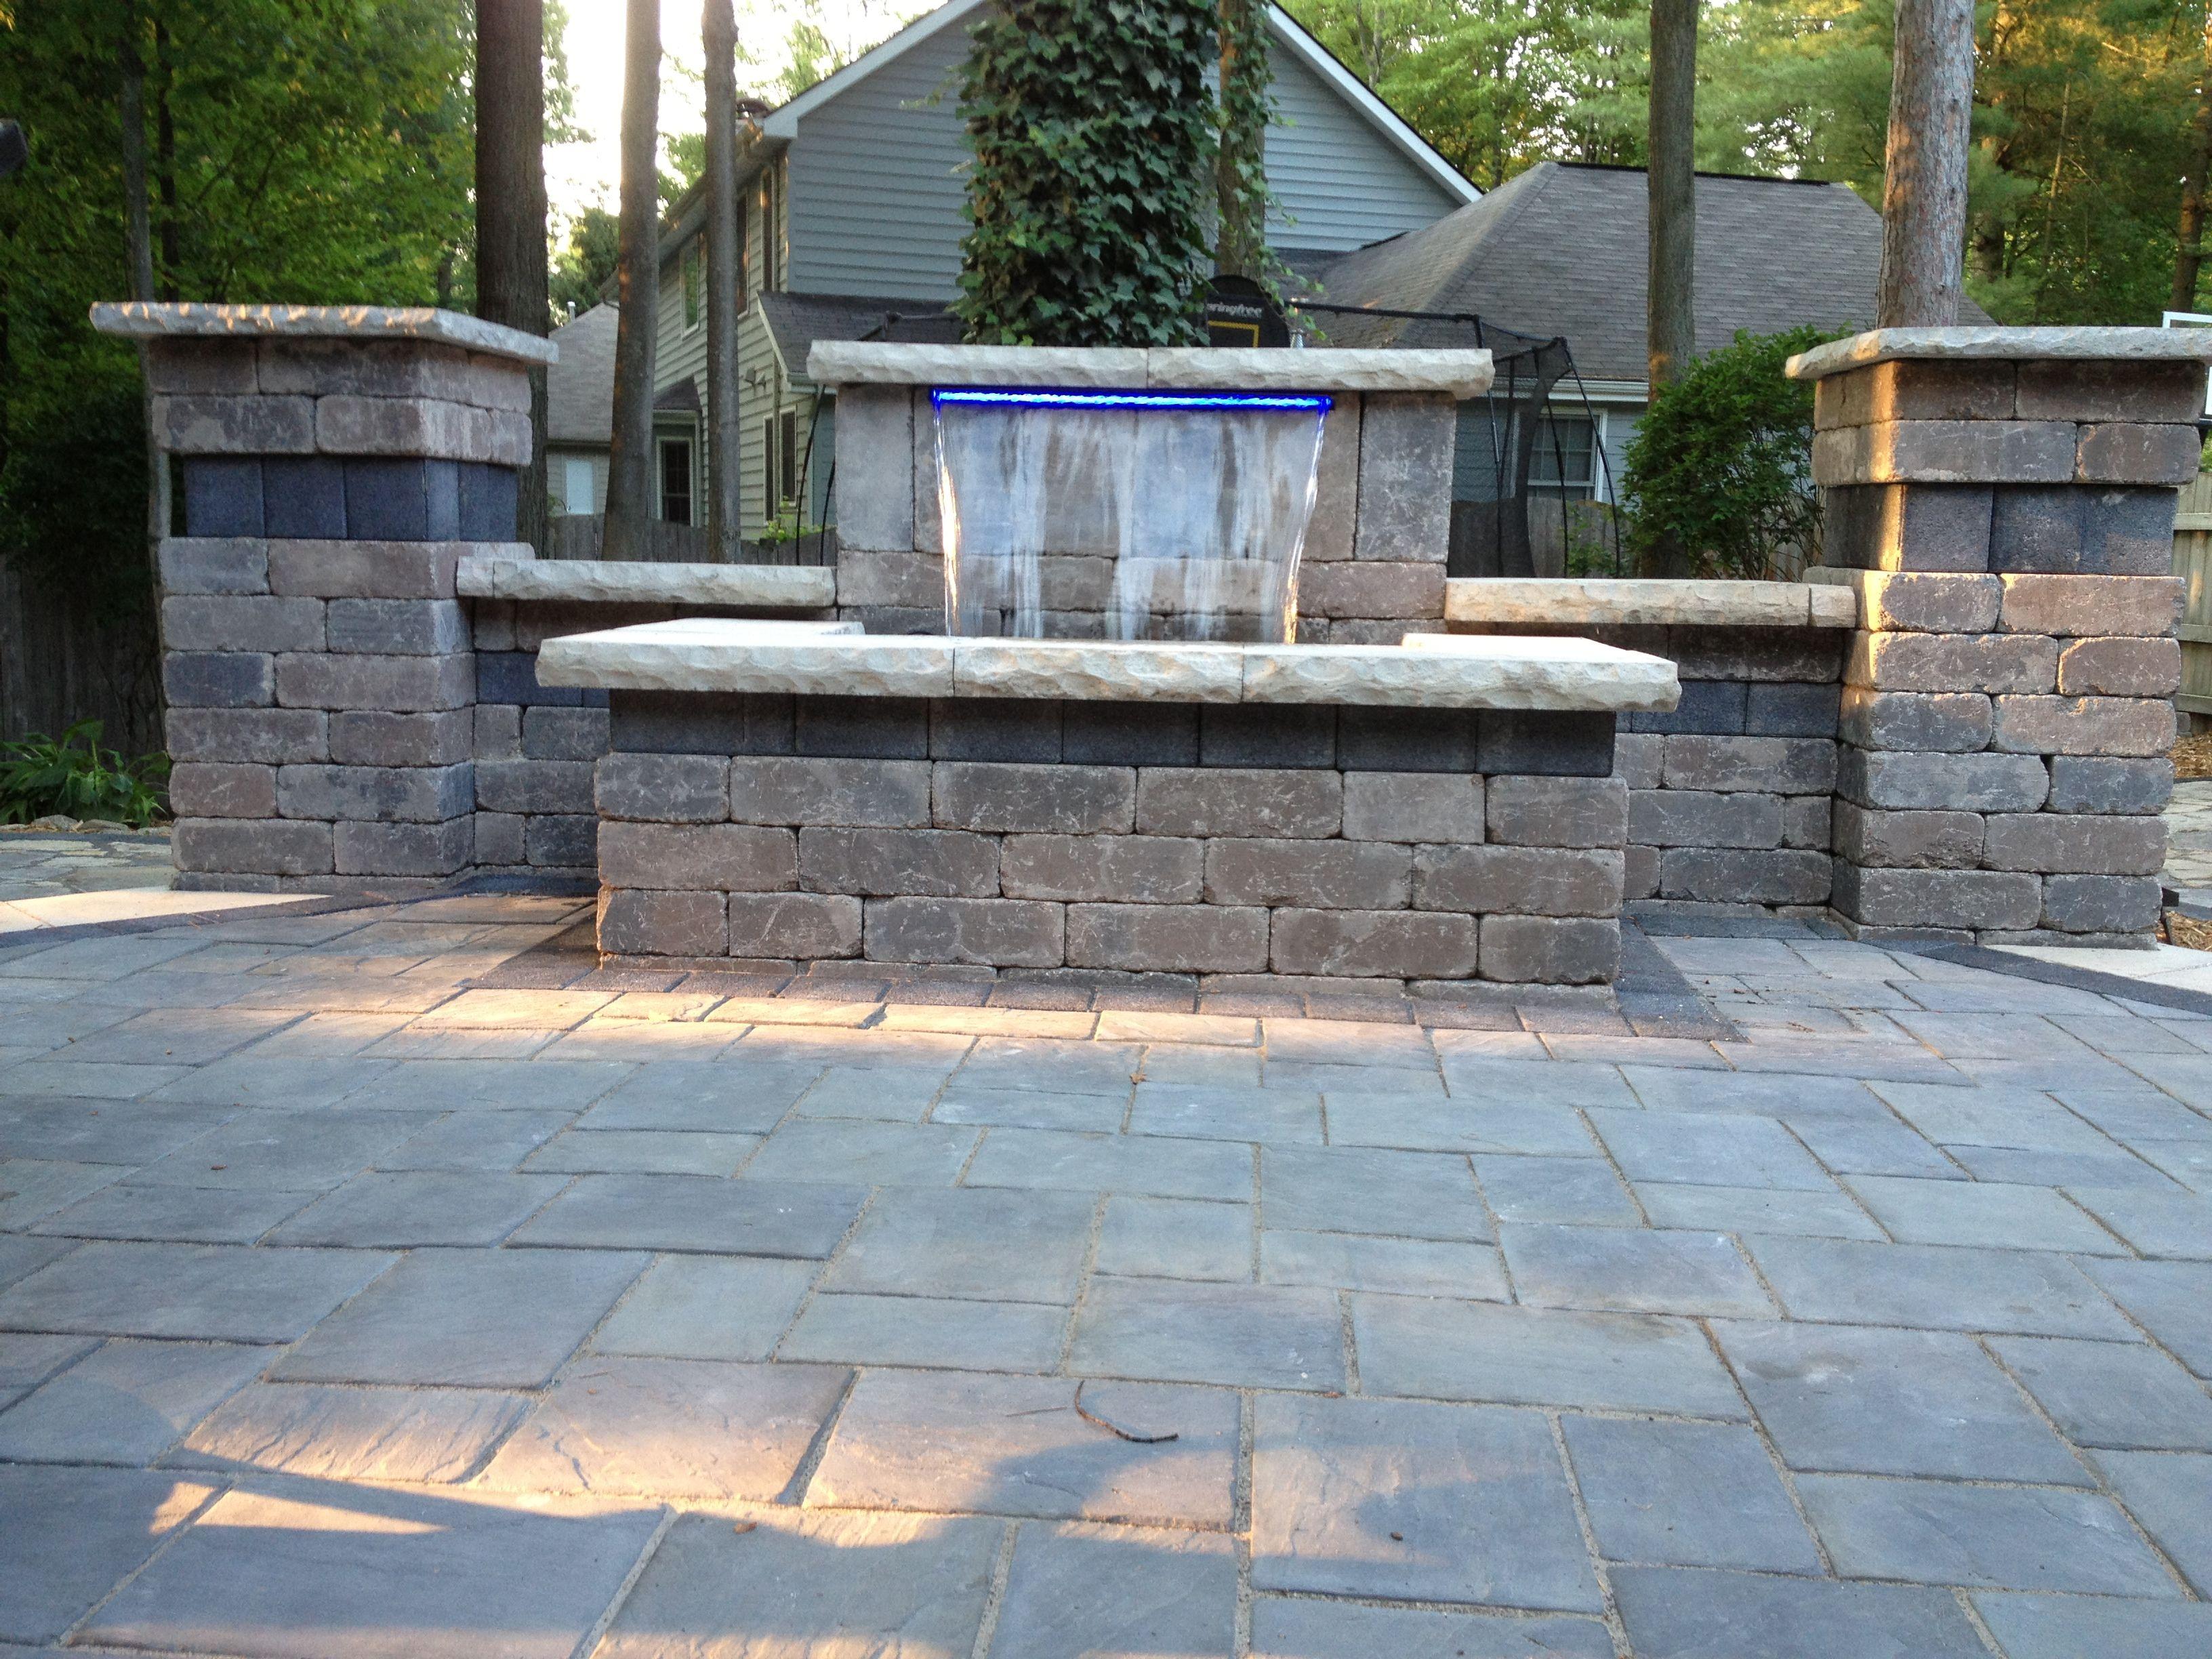 Beautiful waterfall and patio using Unilock brick pavers. Stonehenge  coping, Series 3000 black accent